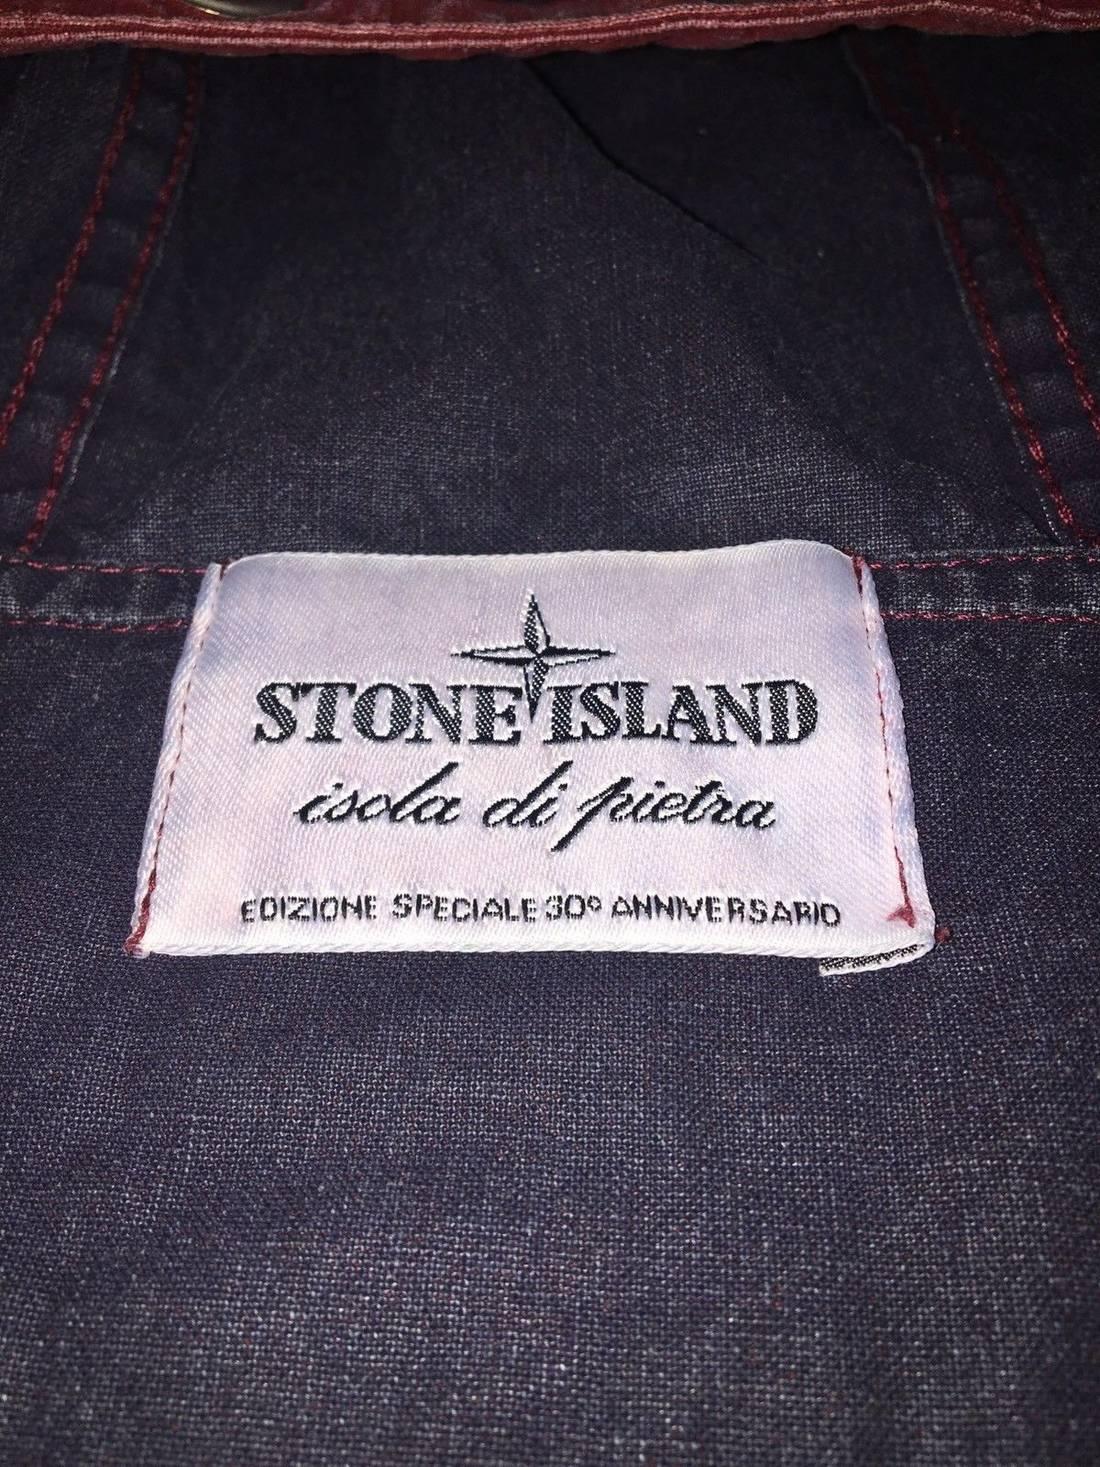 stone island stone island 30th anniversary tela stella jacket xxl